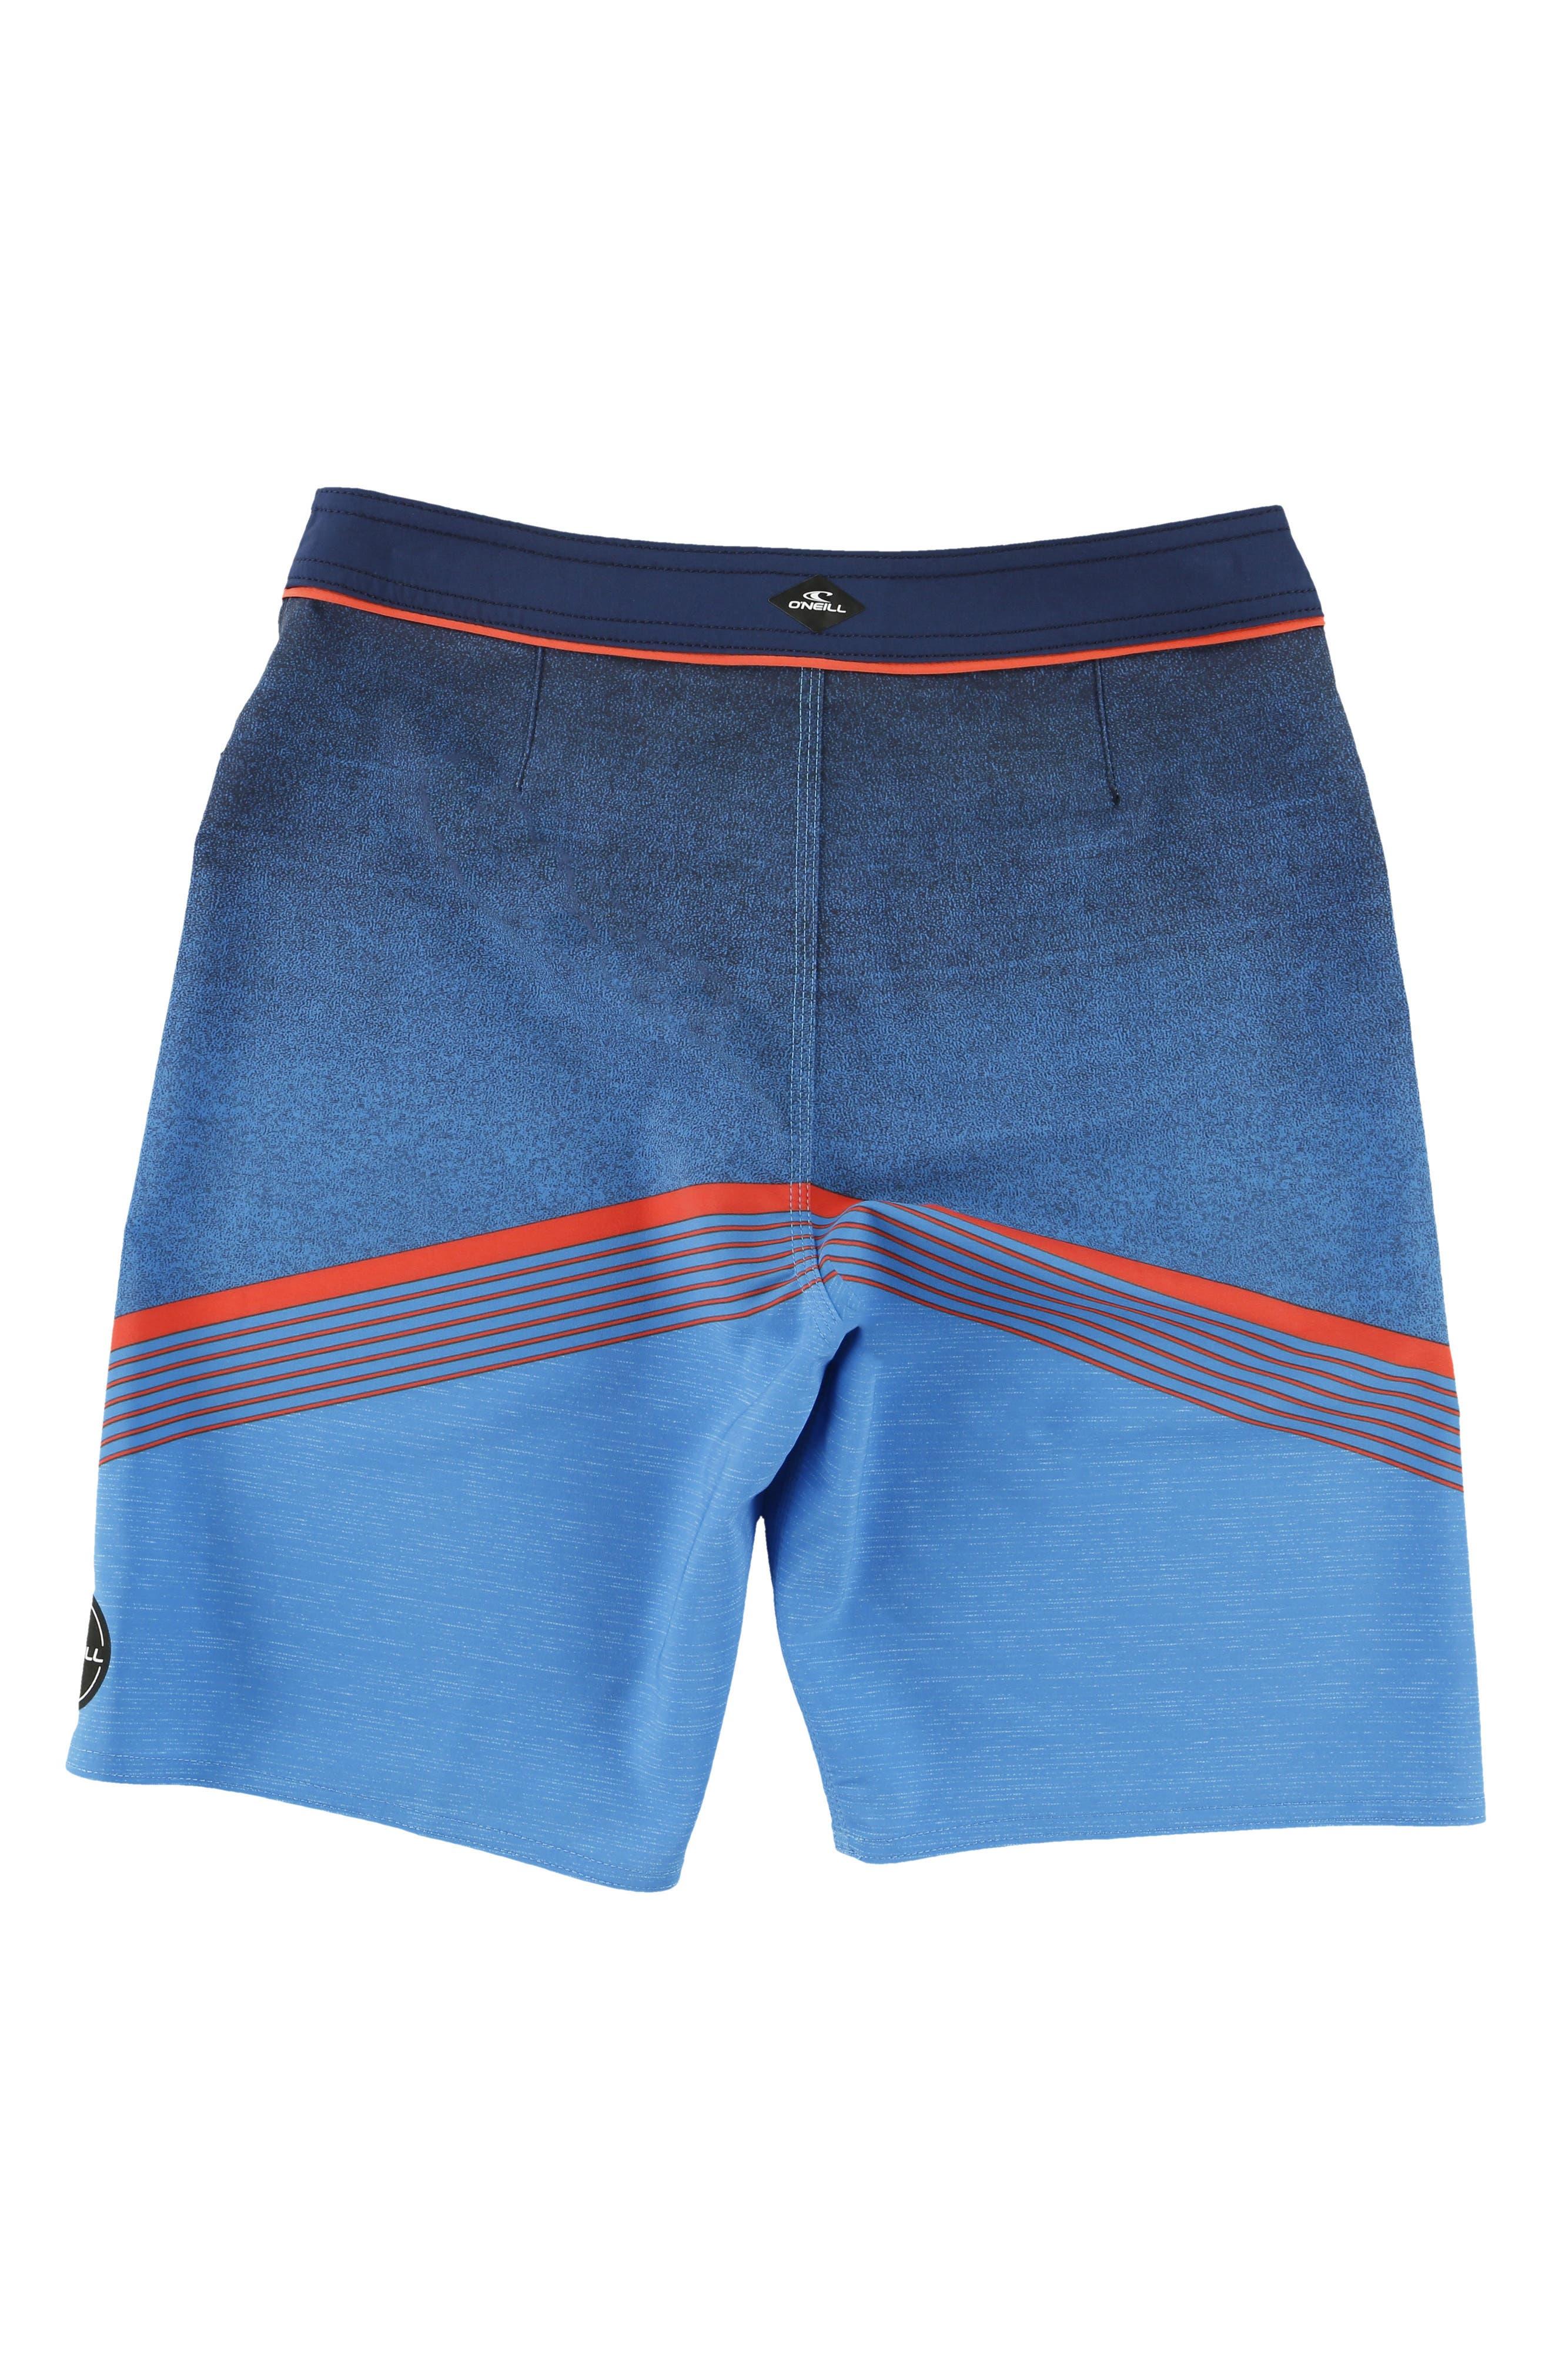 Hyperfreak Stretch Board Shorts,                         Main,                         color, 410